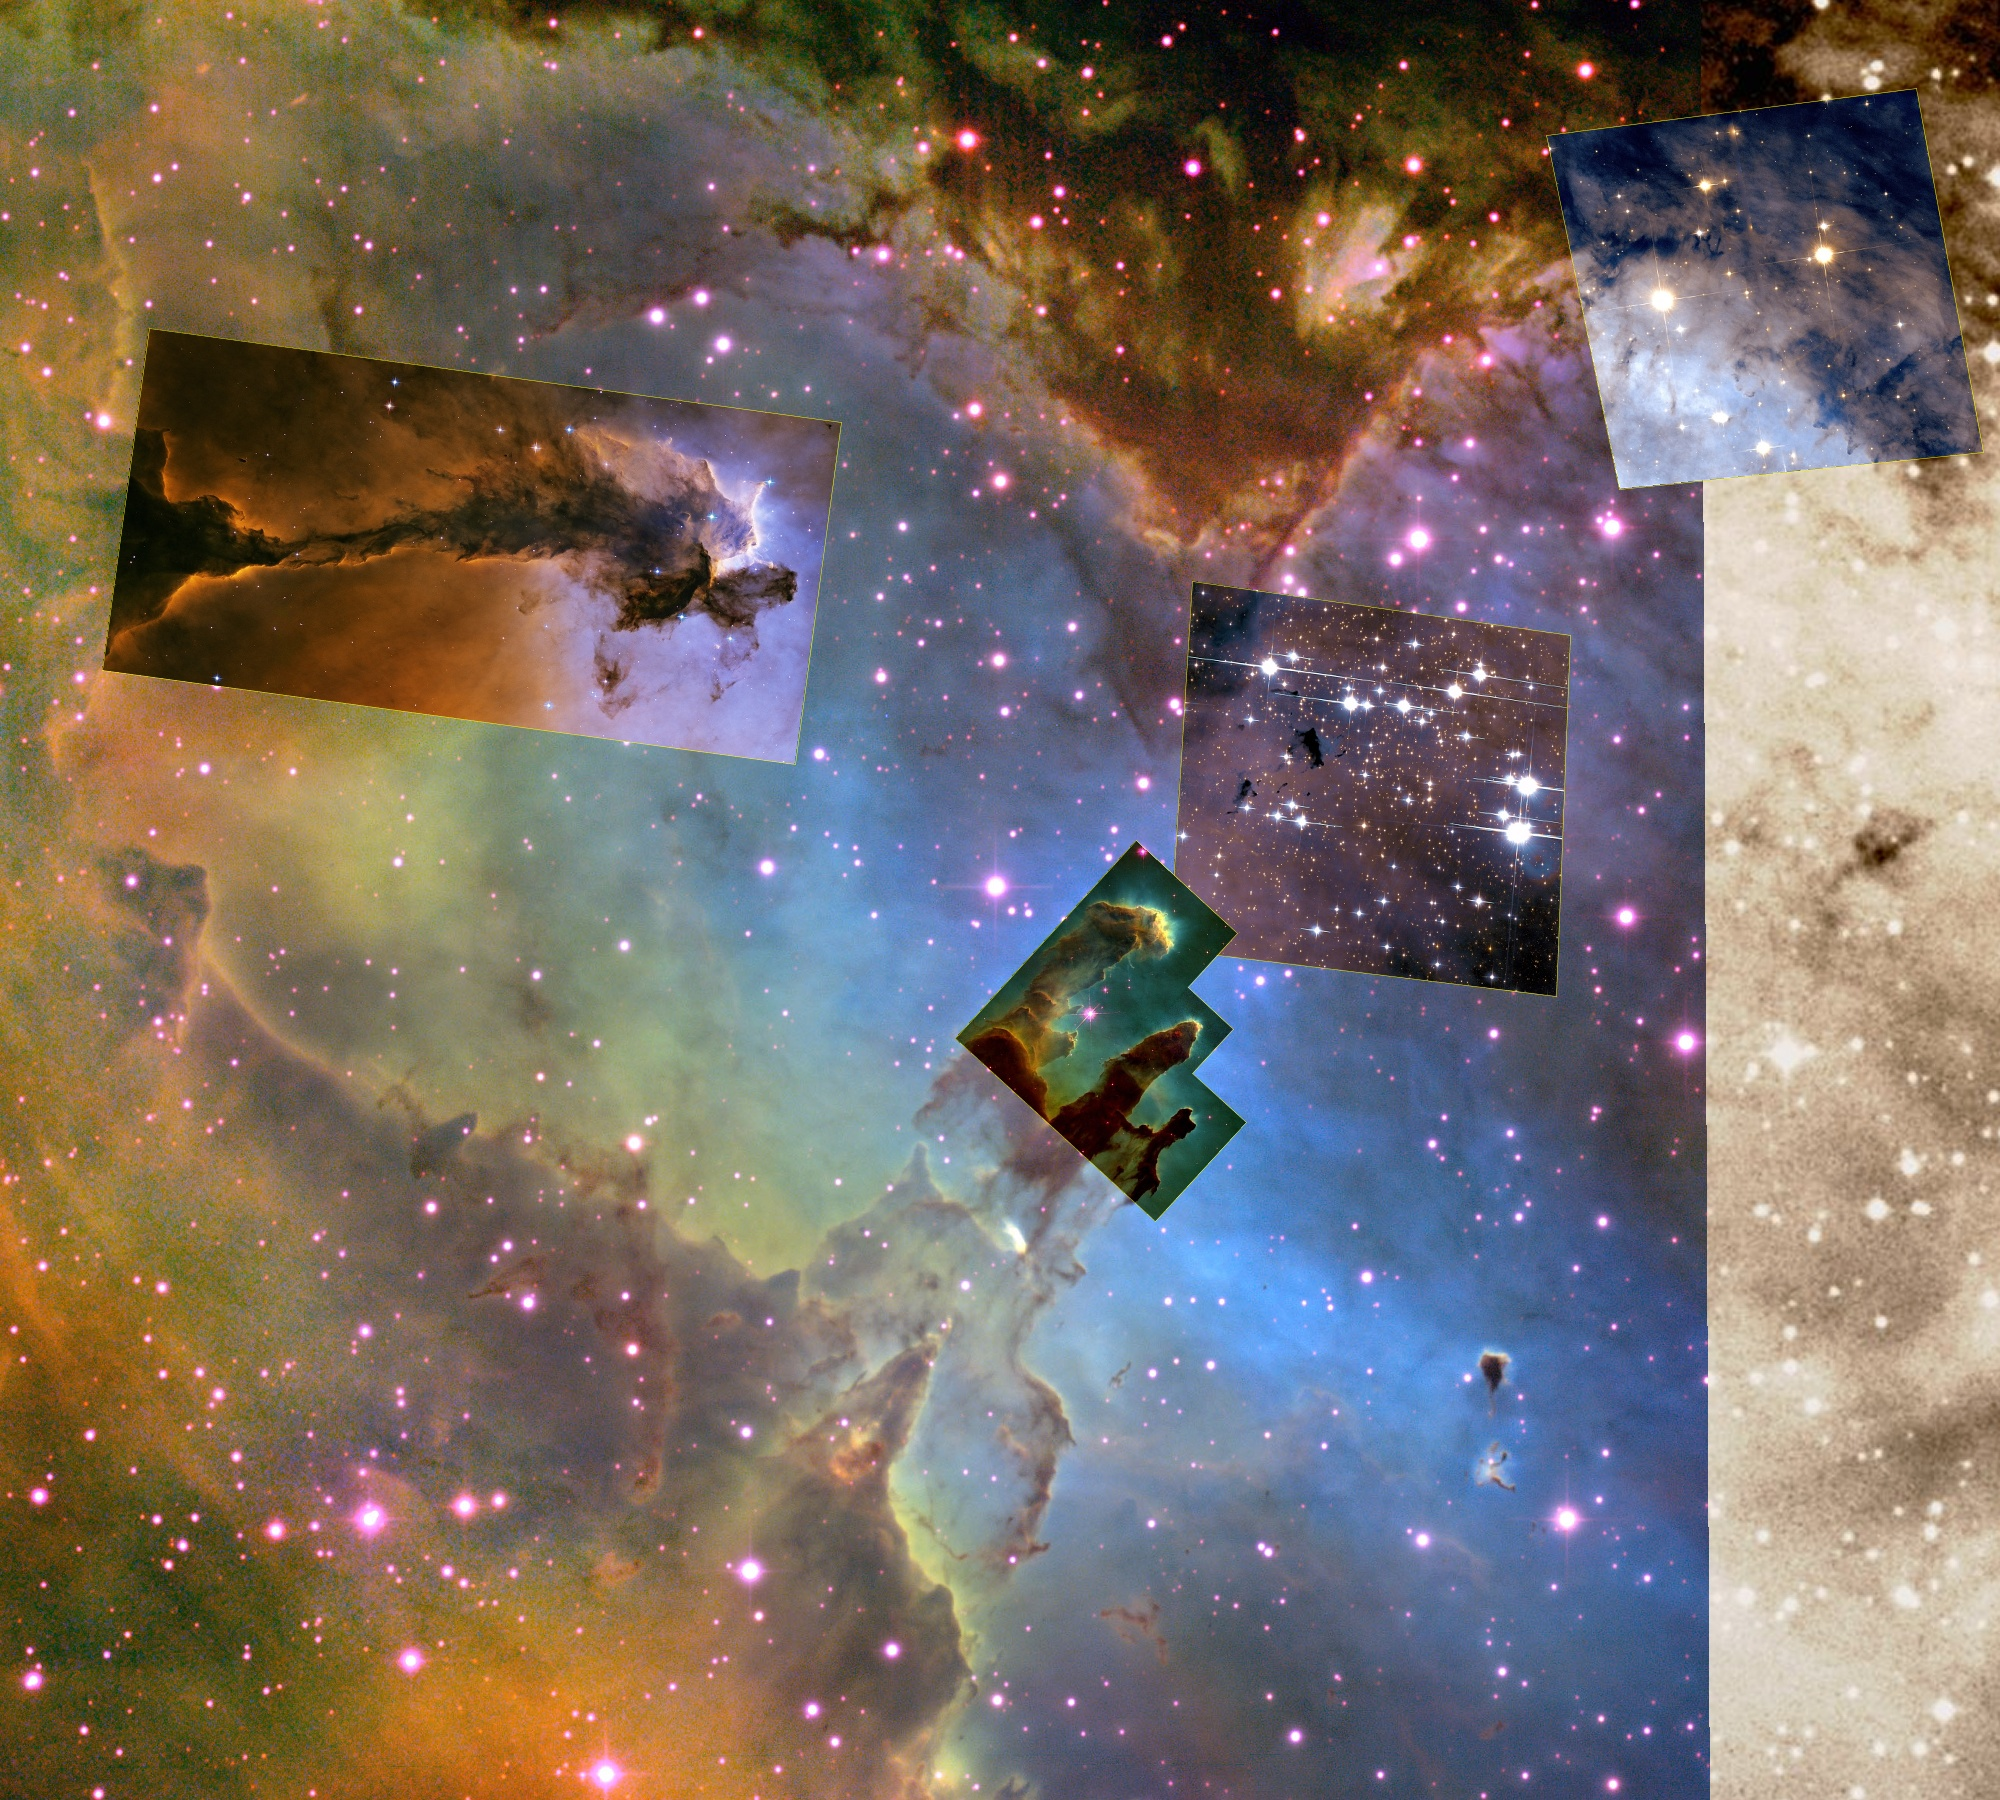 eagle nebula s - photo #26